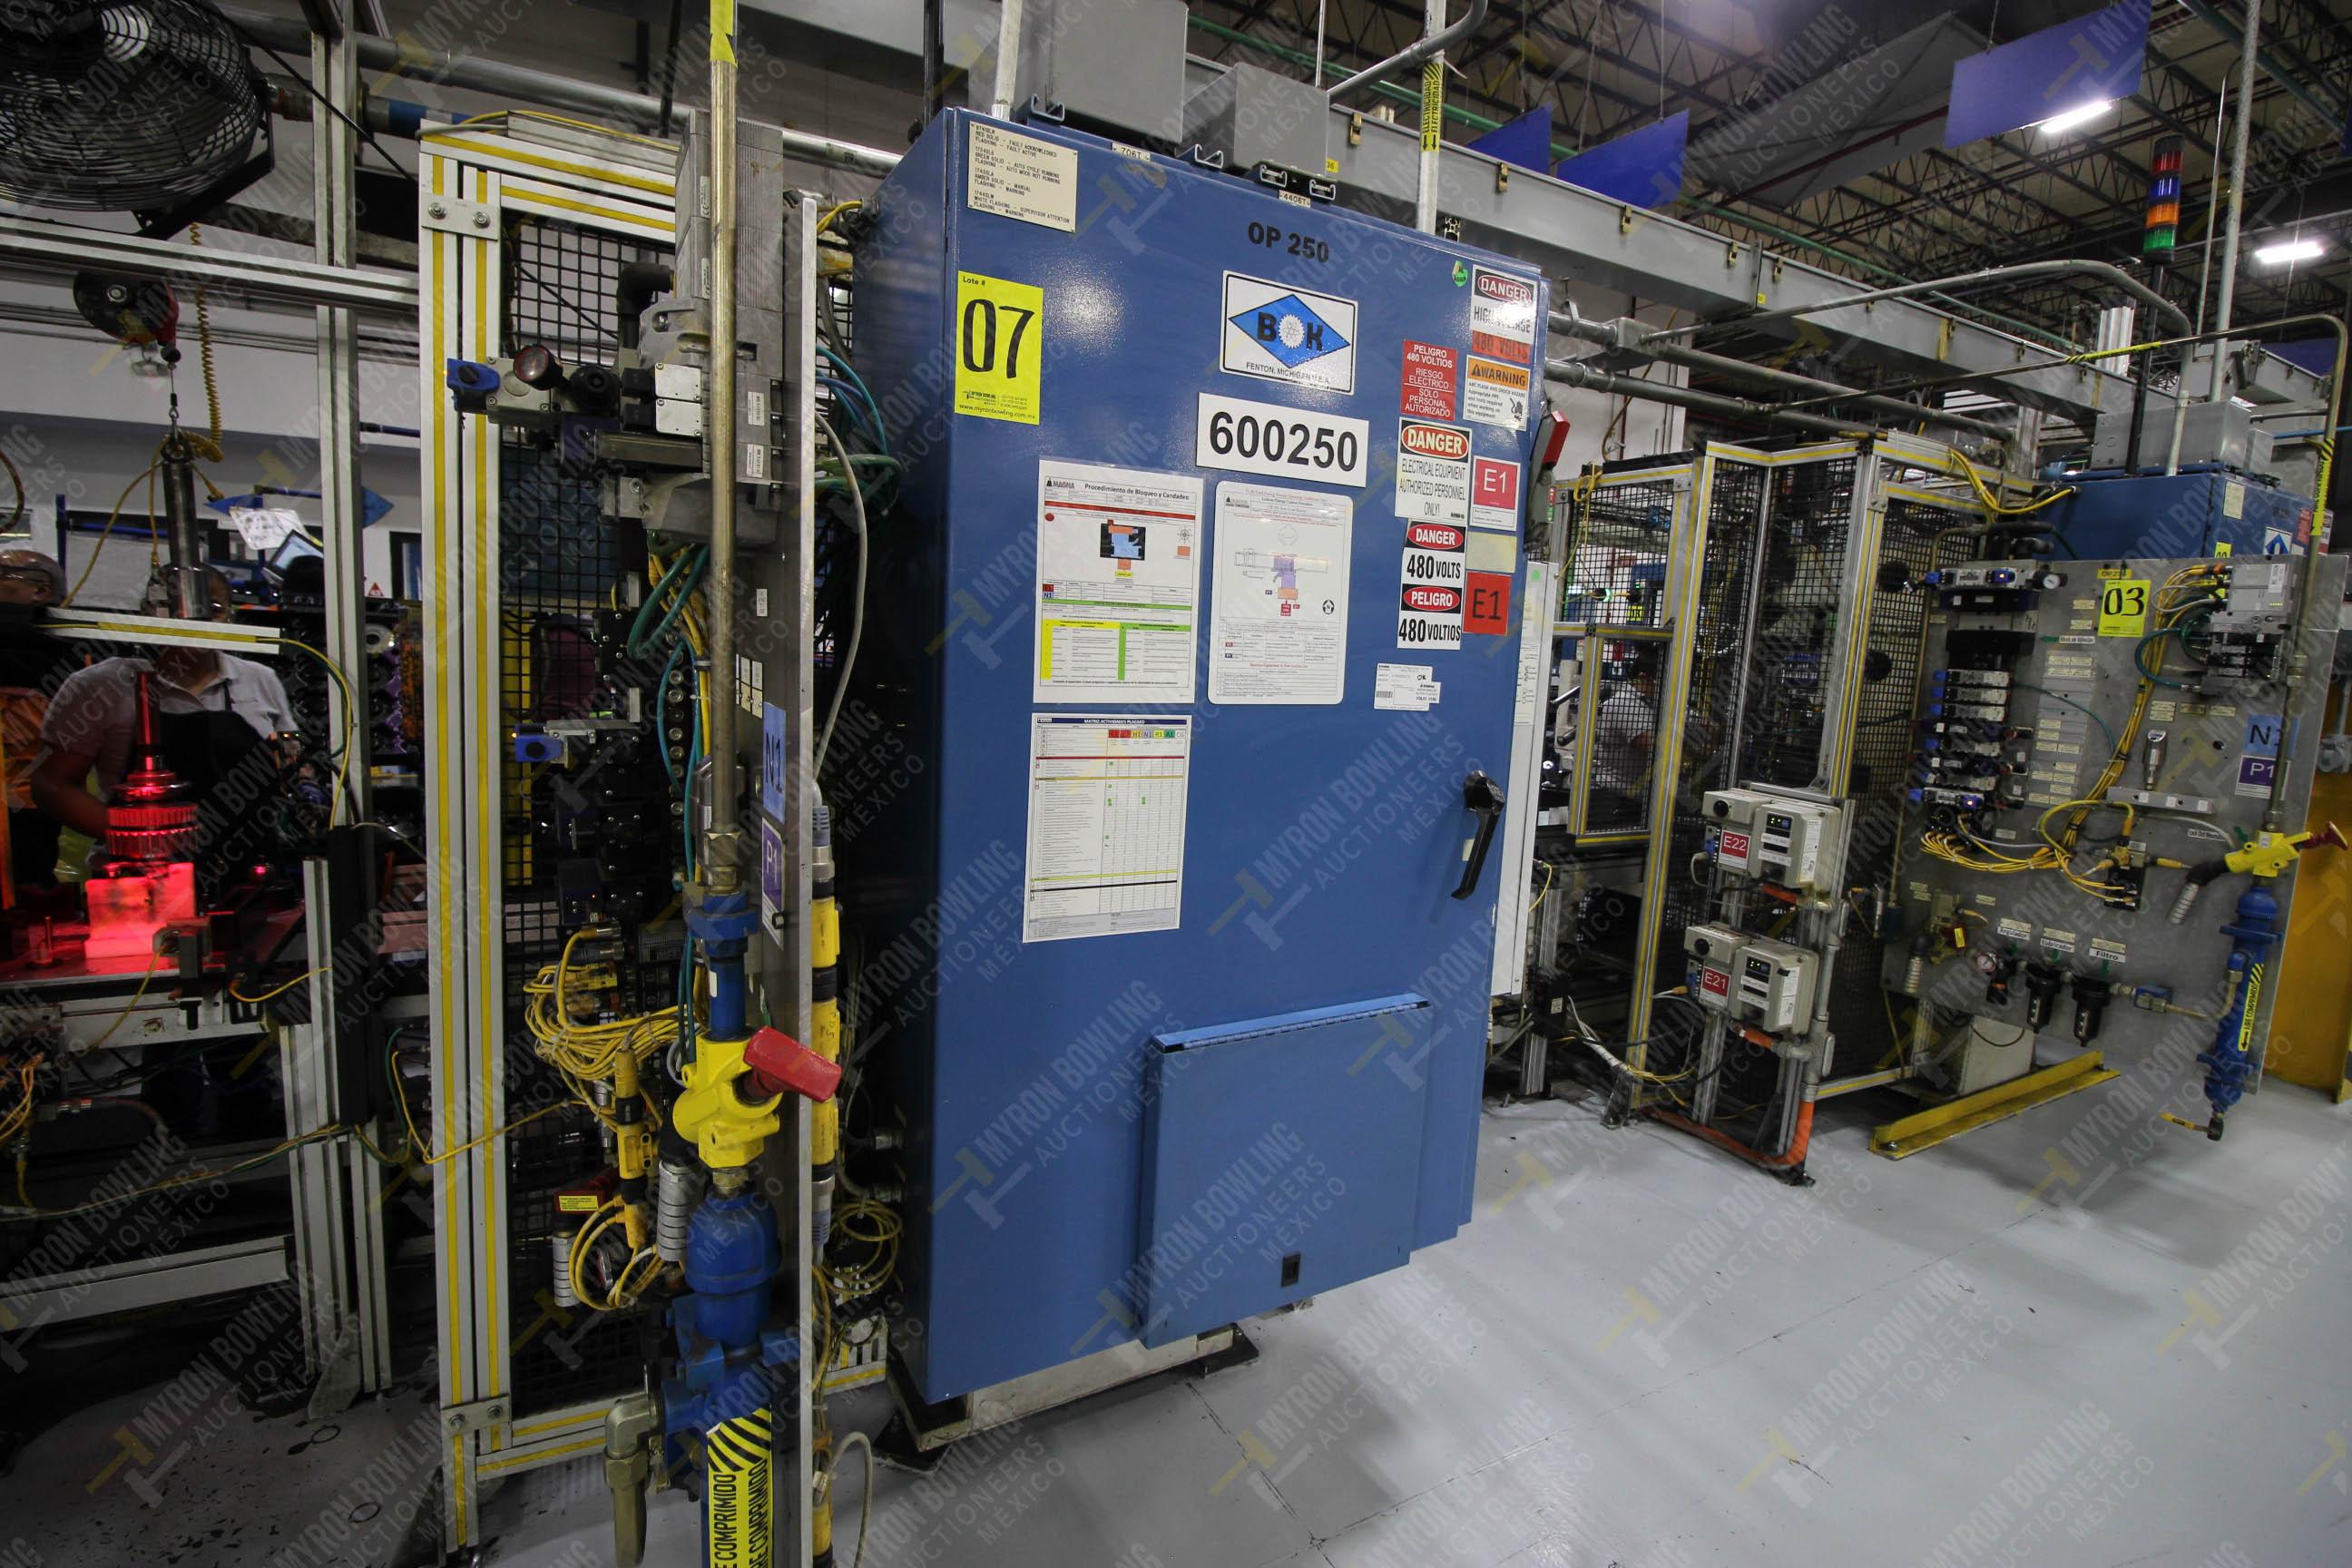 Estación semiautomática para operación 250 de ensamble de candado, contiene - Image 18 of 21